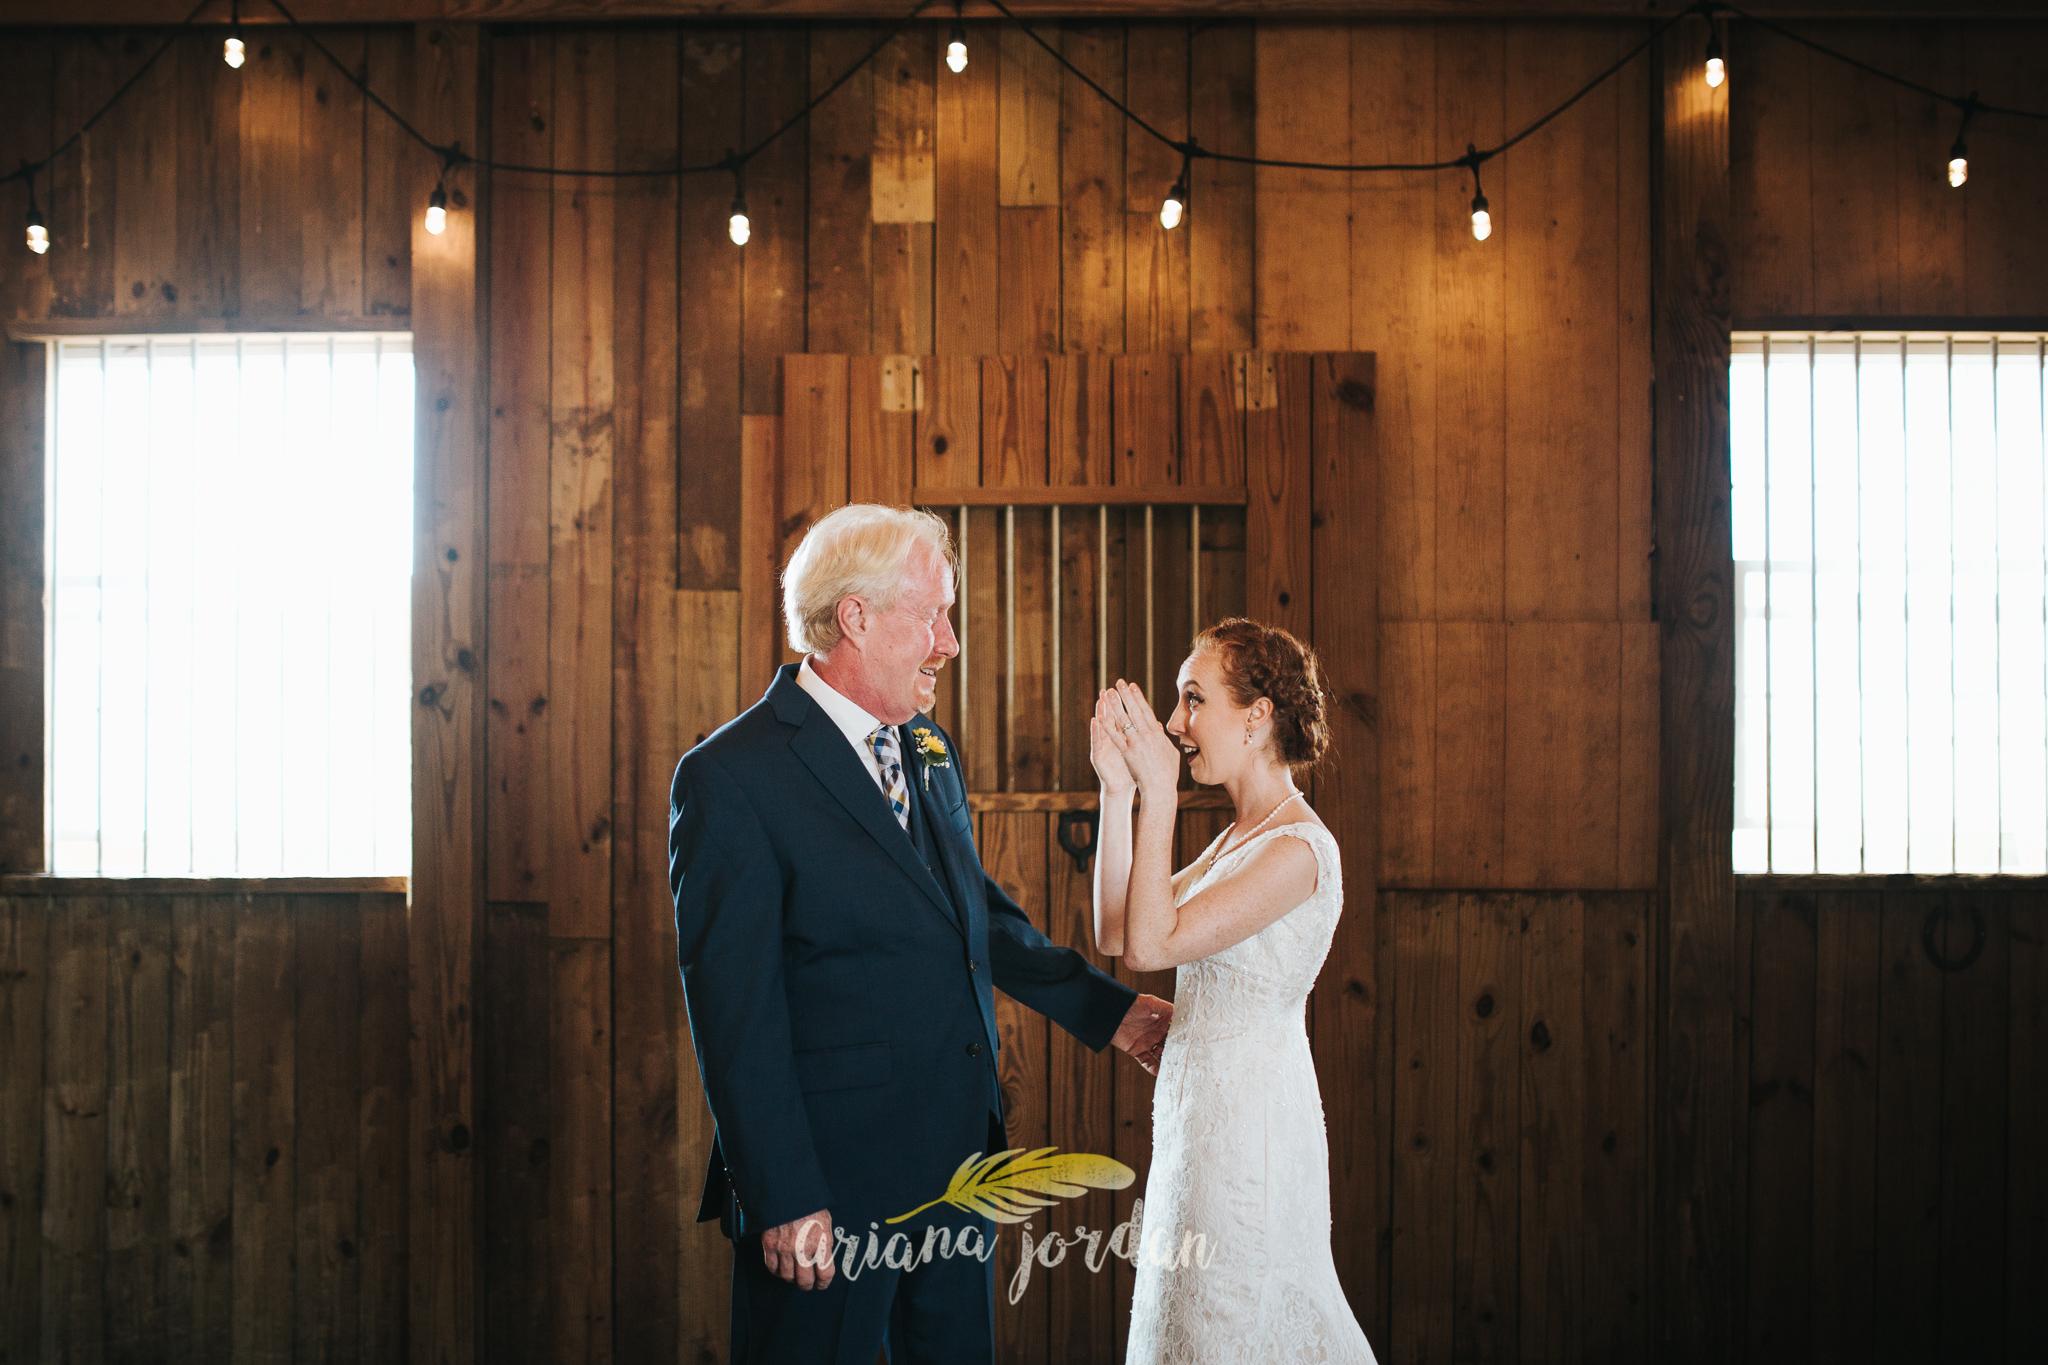 051 Ariana Jordan Photography -Moonlight Fields Lexington Ky Wedding Photographer 1447.jpg